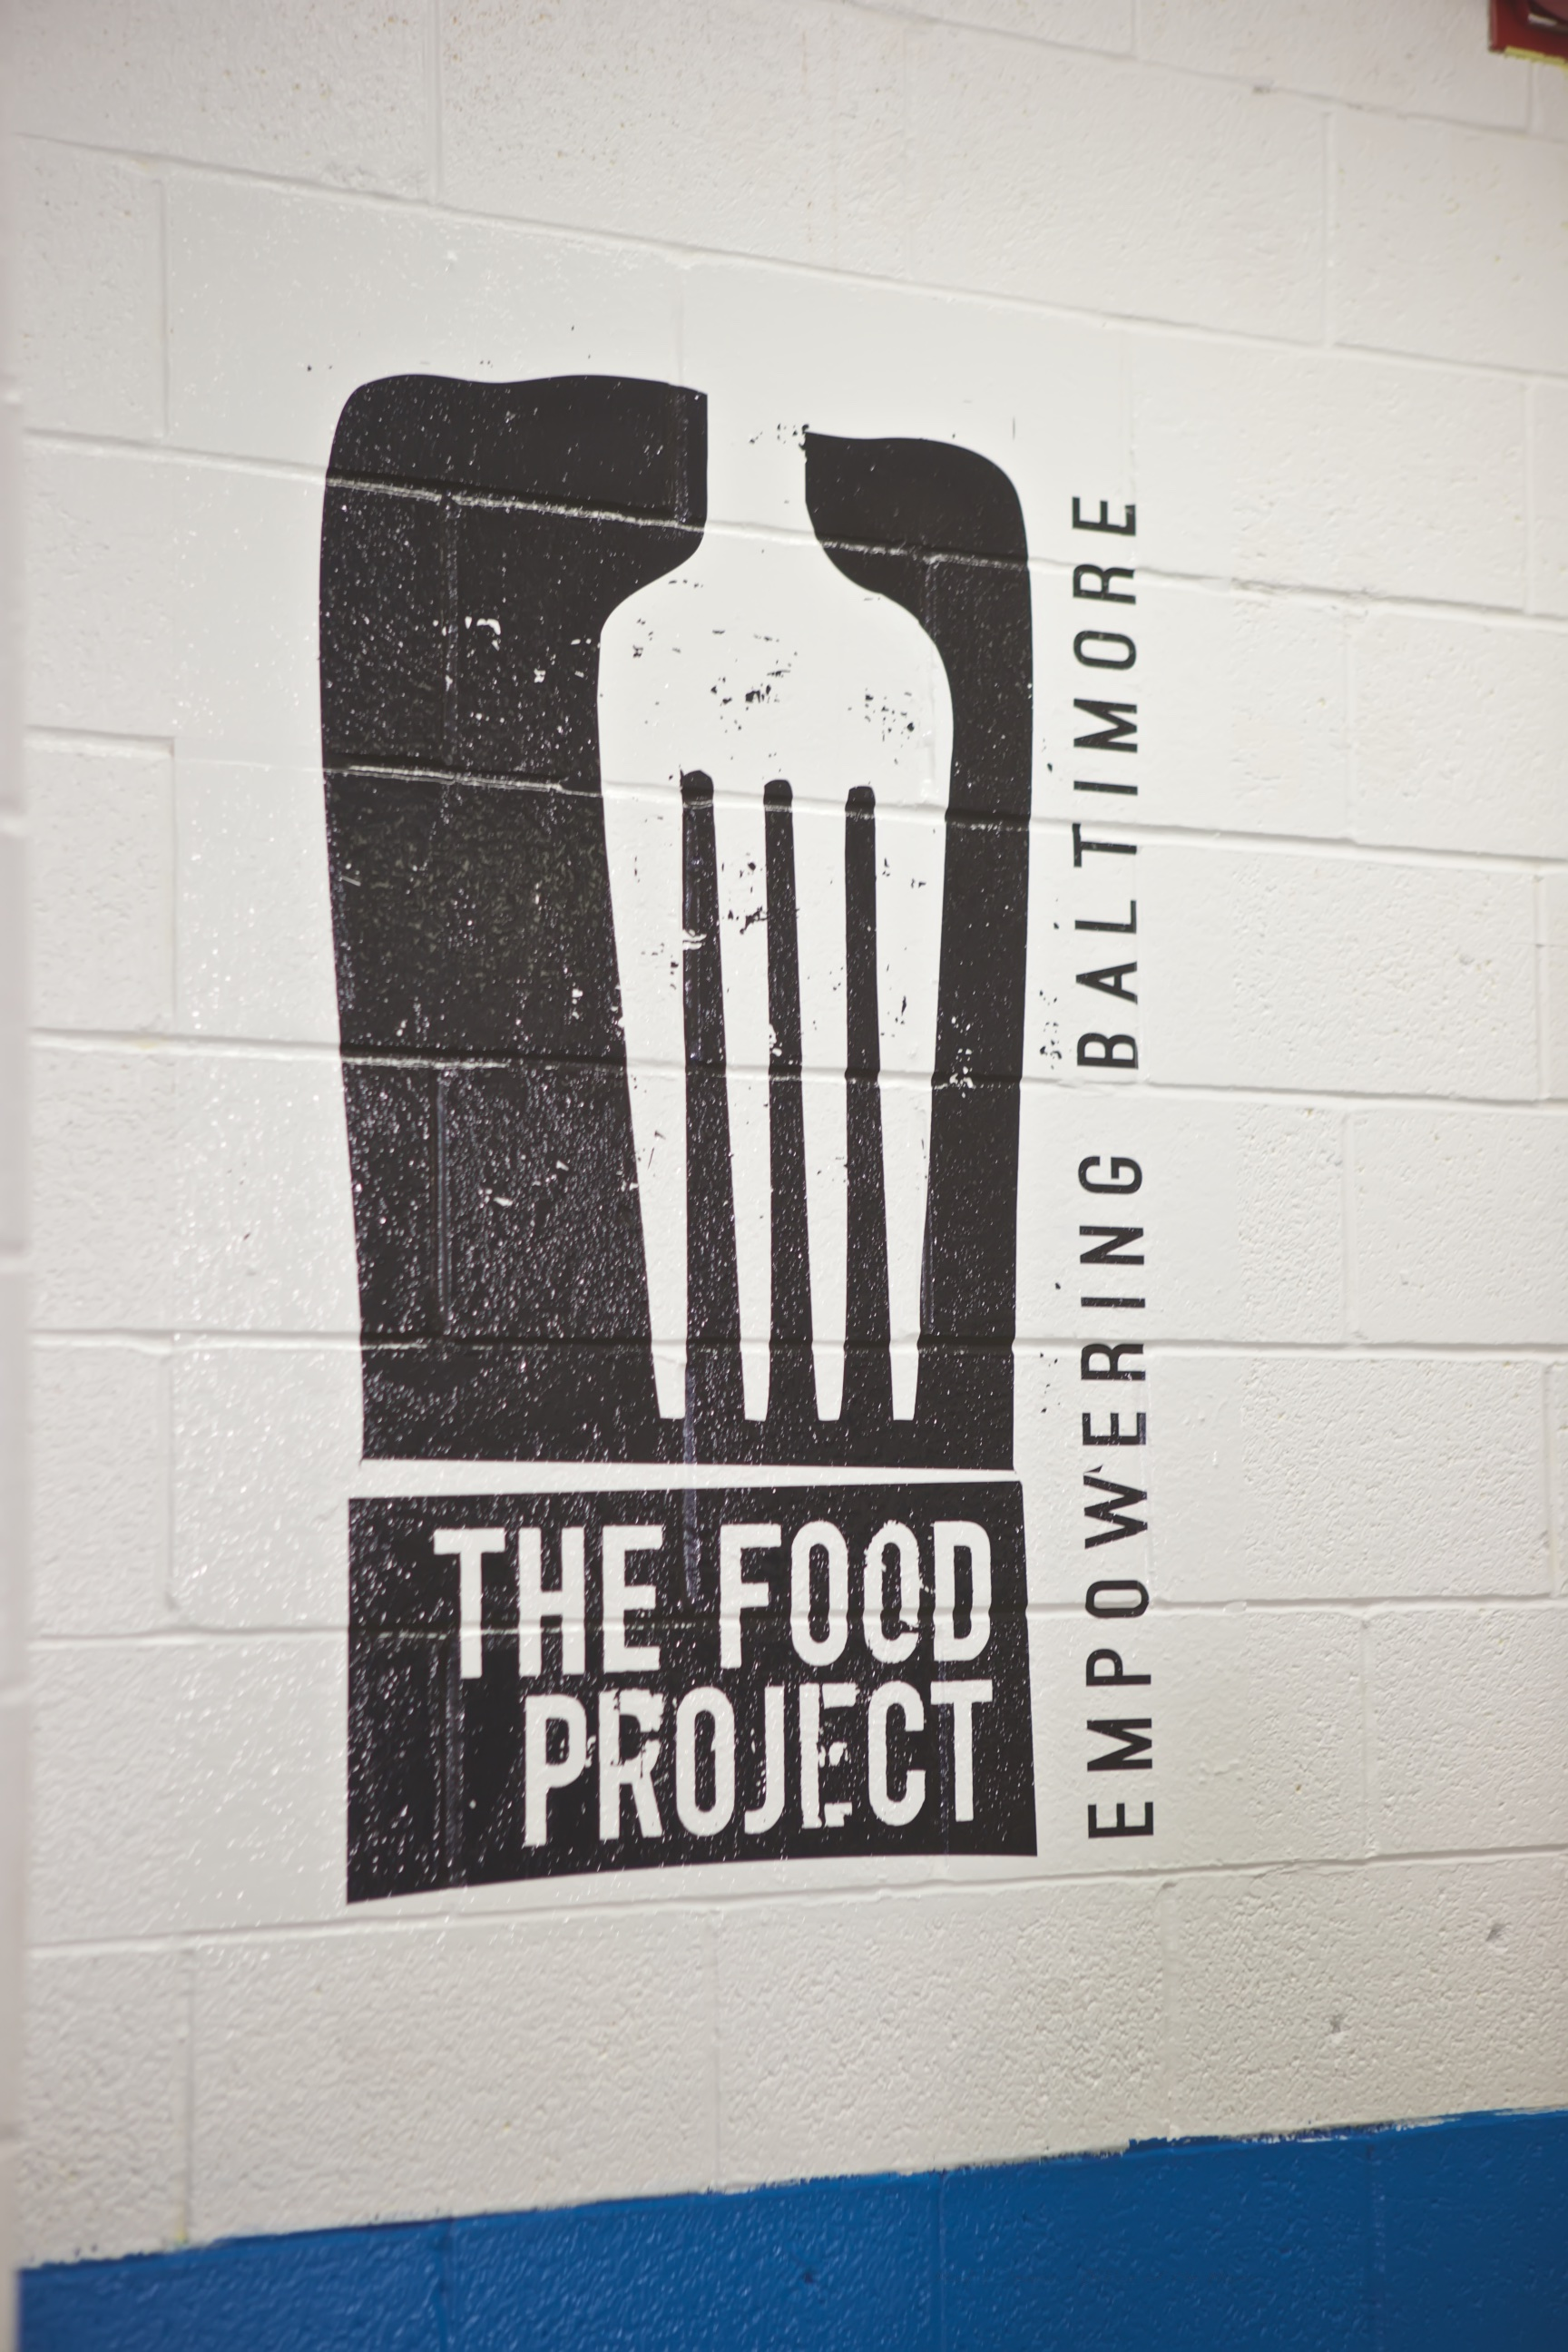 January 26, 2019 - Site visit to The Food Project, 424 S. Pulaski Street 2019-01-26 (1).jpg